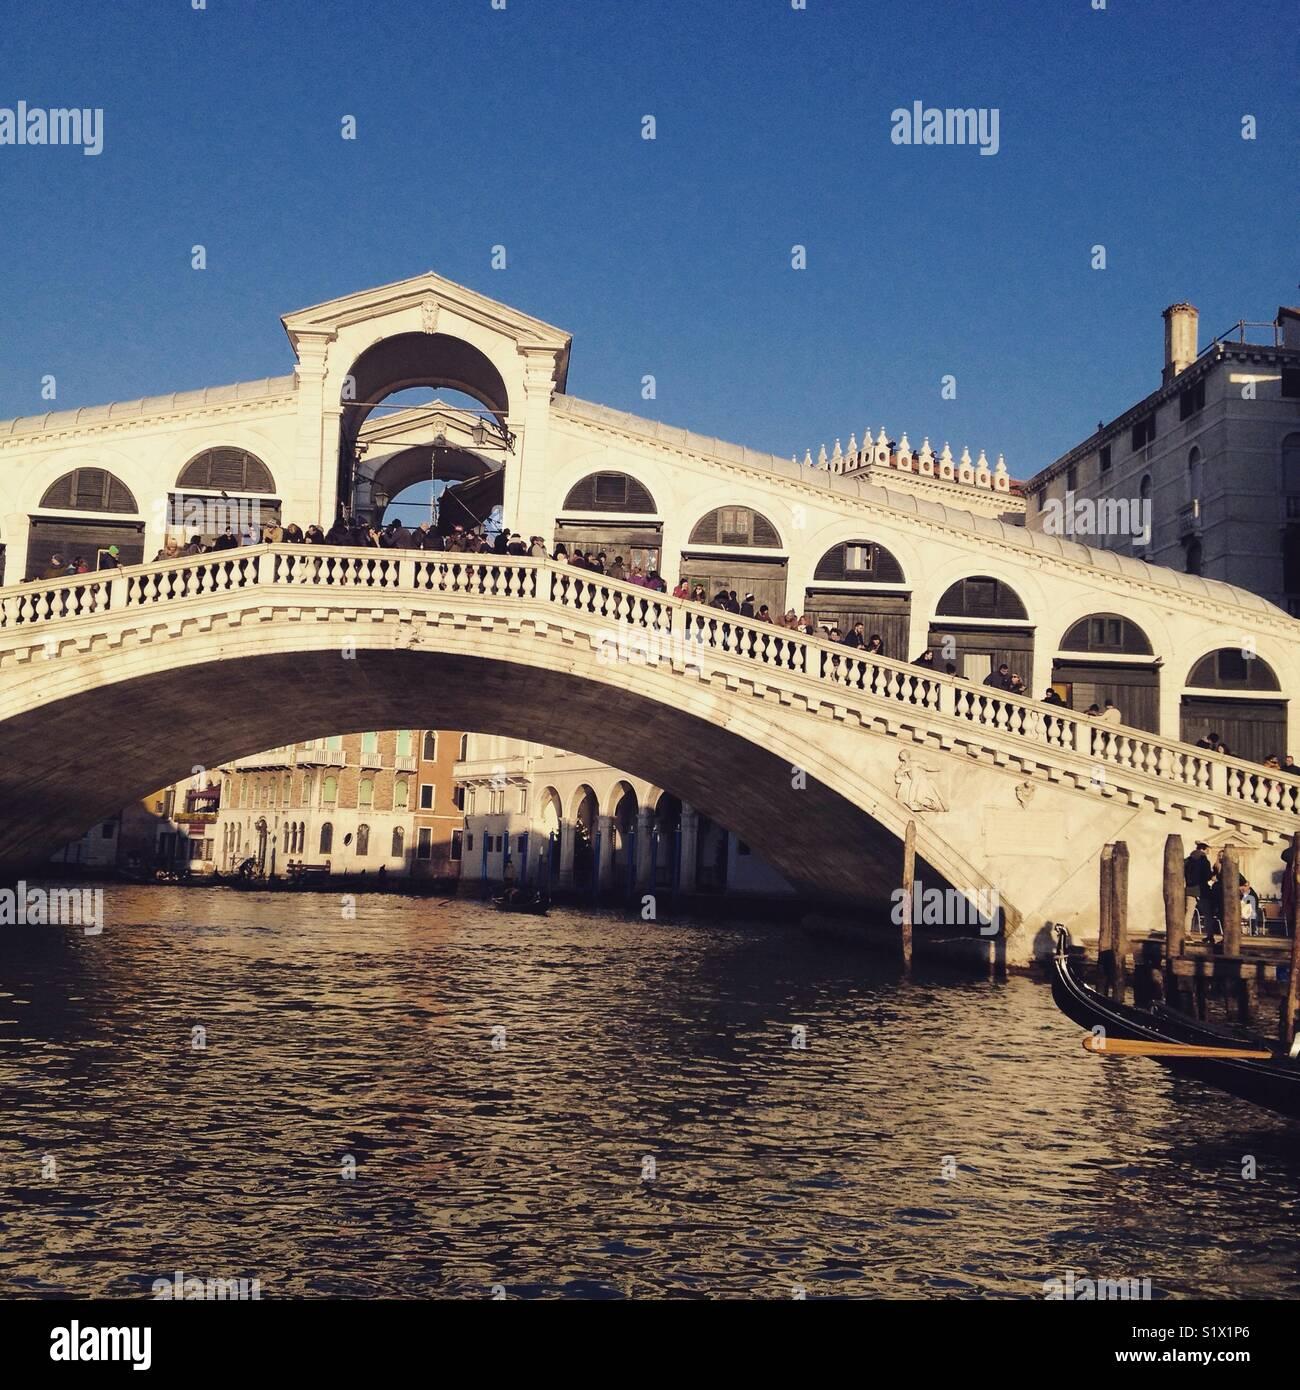 Ponte di Rialto, Venice, architecture, Italy, history, astonishing, breathless, romantic, heritage, travel, place - Stock Image